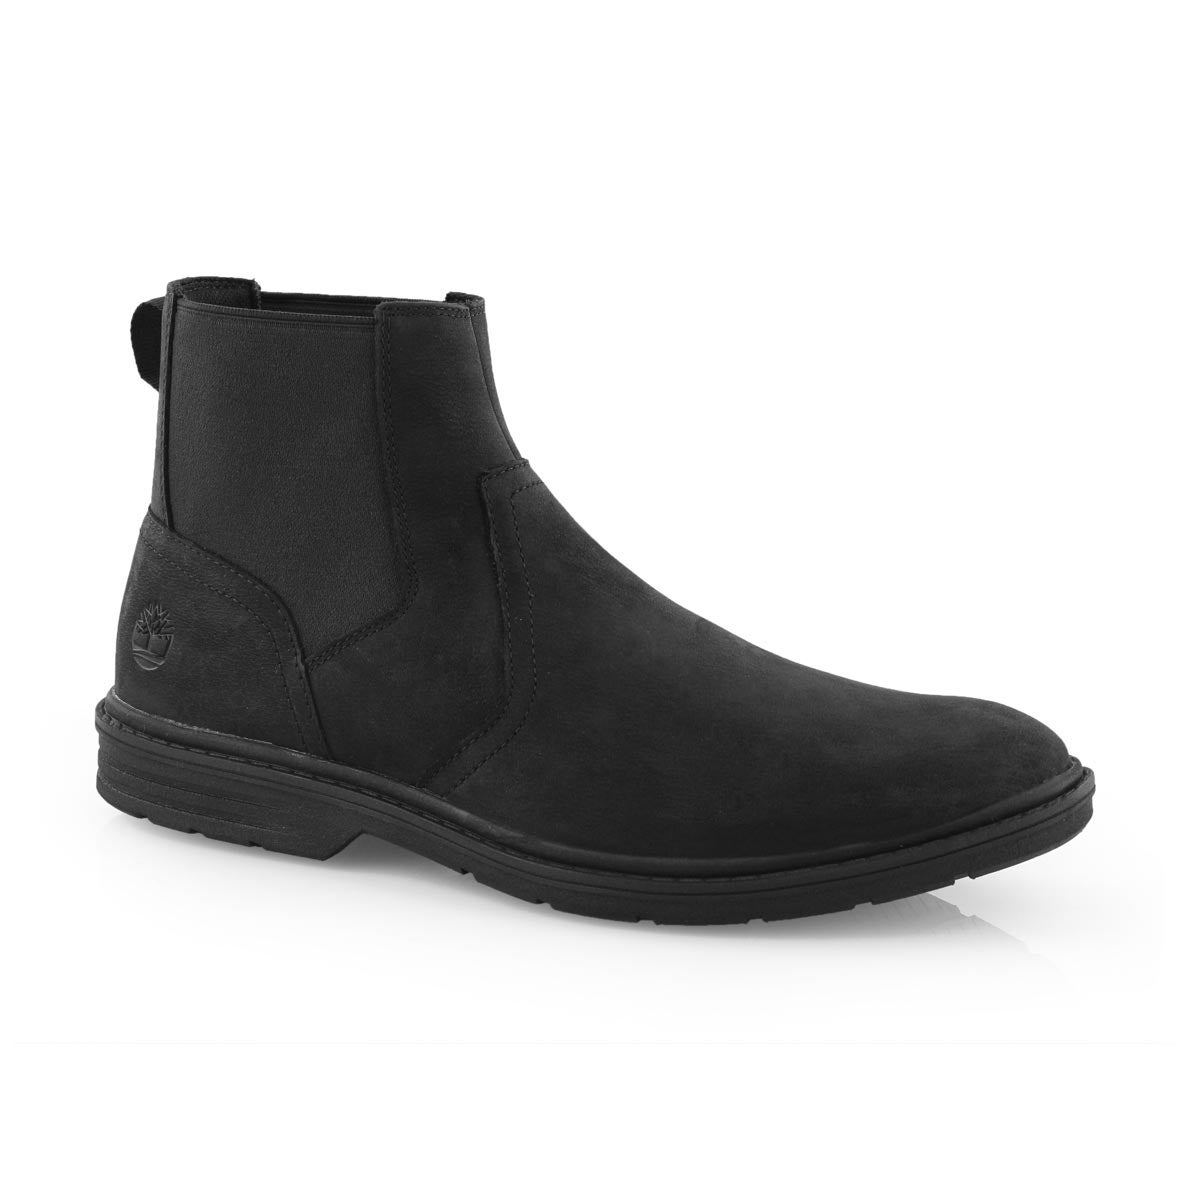 Men's SAWYER LANE black chelsea boots